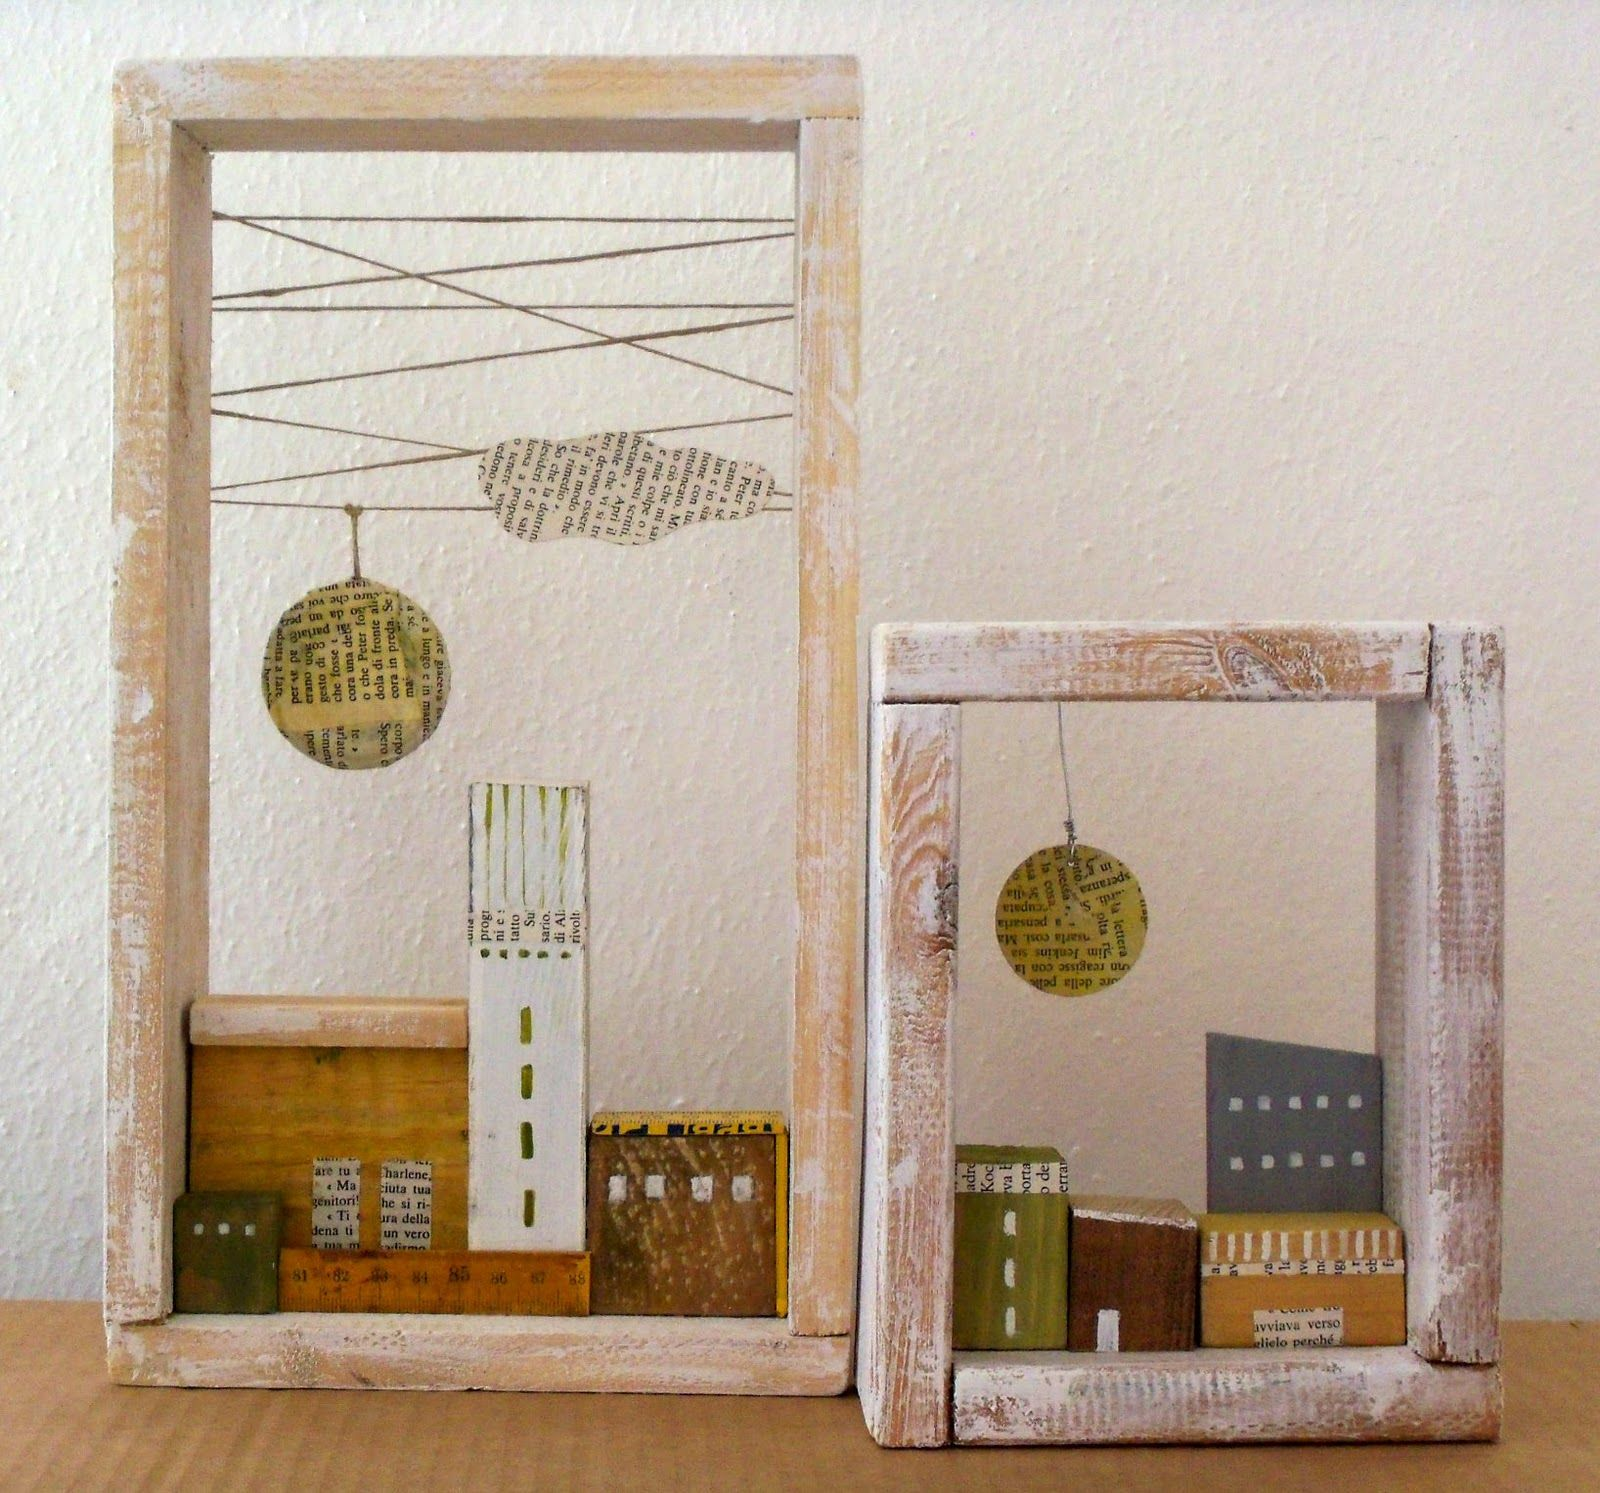 Holzhäuser im Rahmen | decoração | Pinterest | Holzhäuschen, Rahmen ...